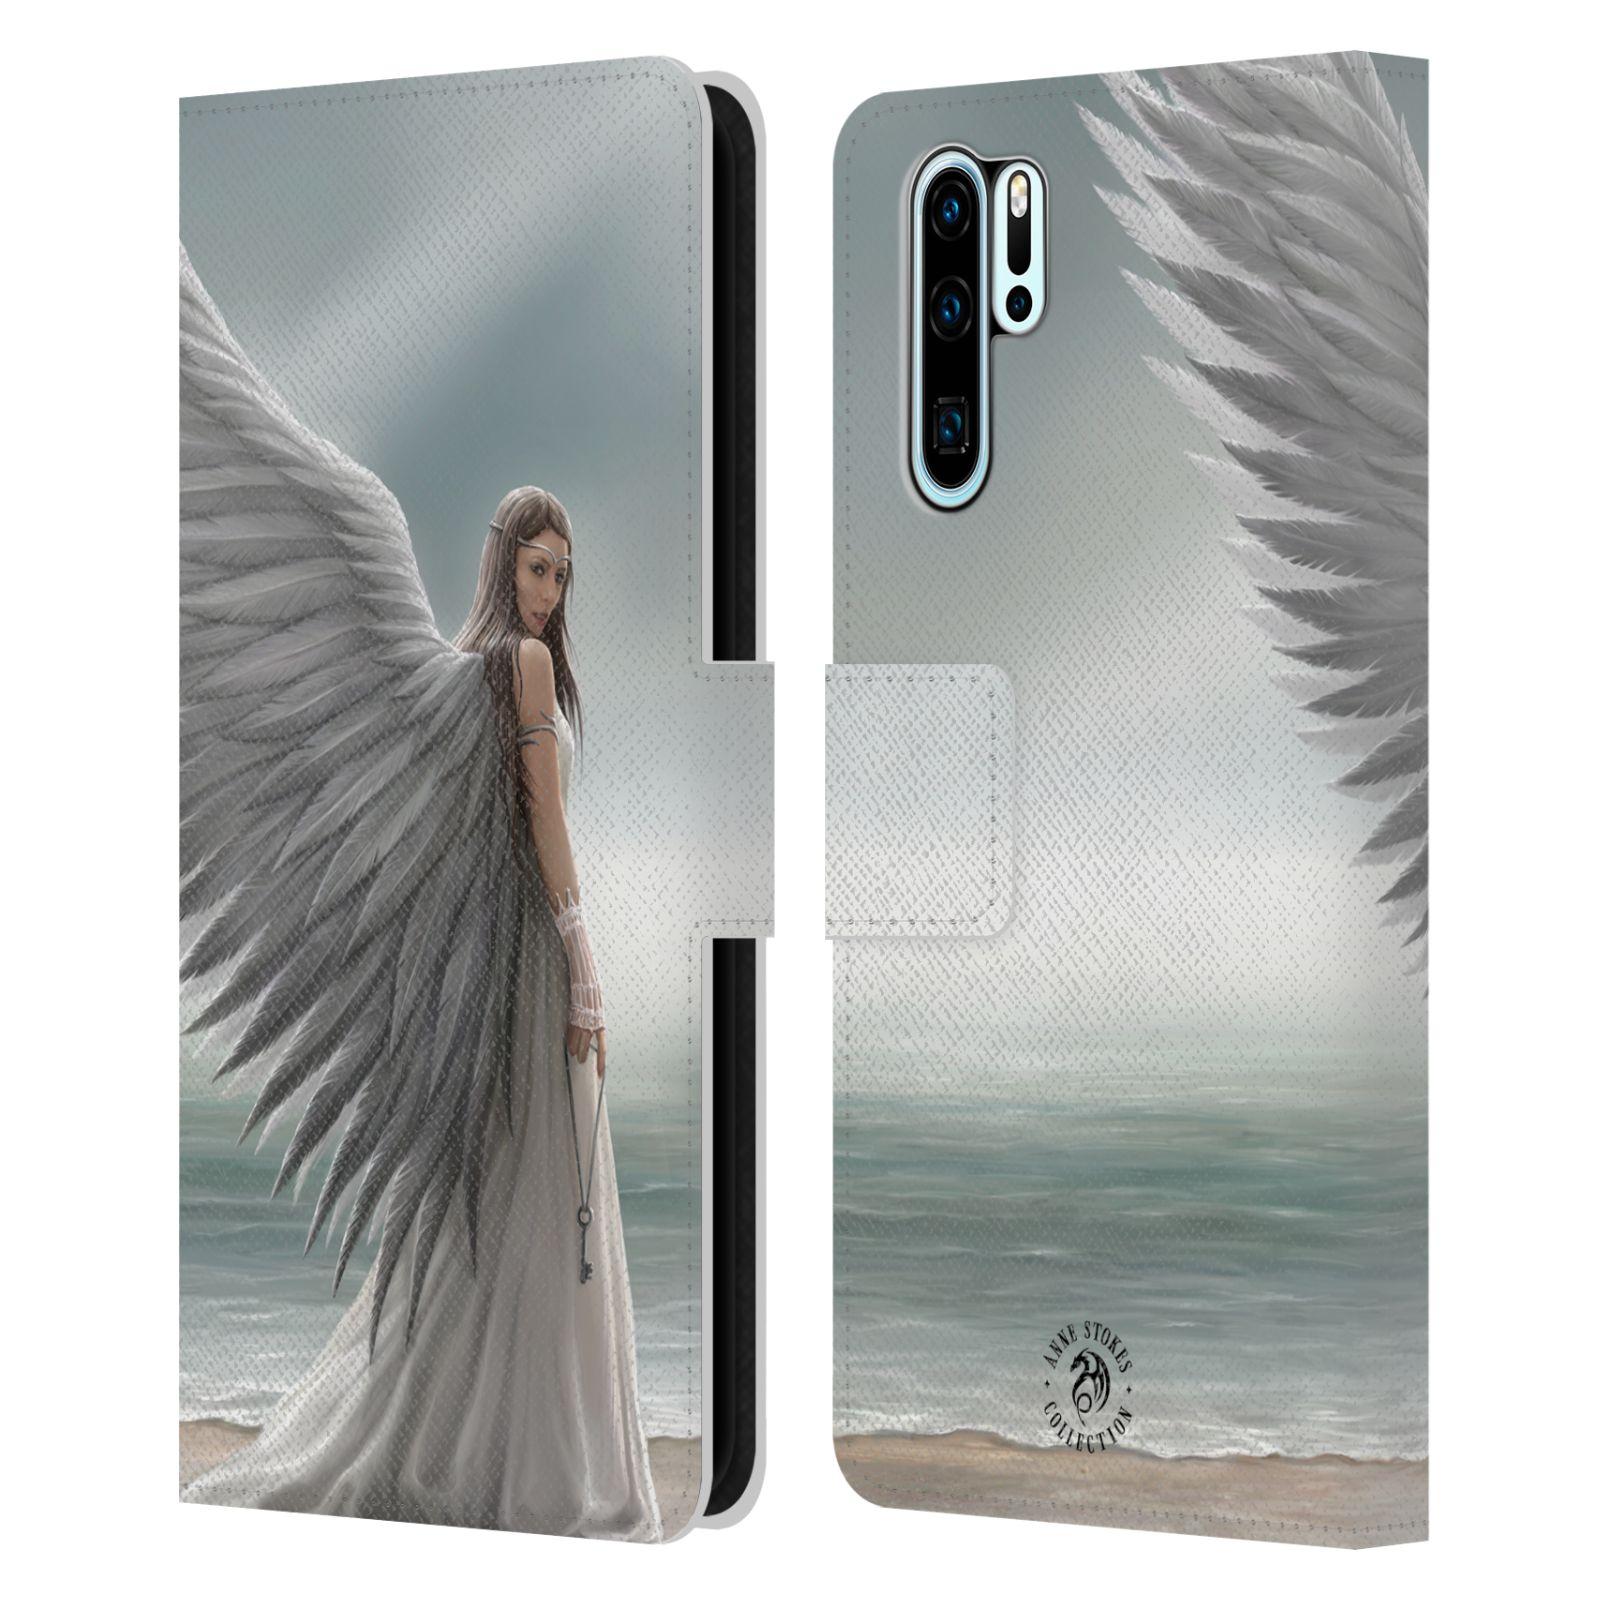 Pouzdro na mobil Huawei P30 PRO - Head Case - fantasy - anděl na pláži